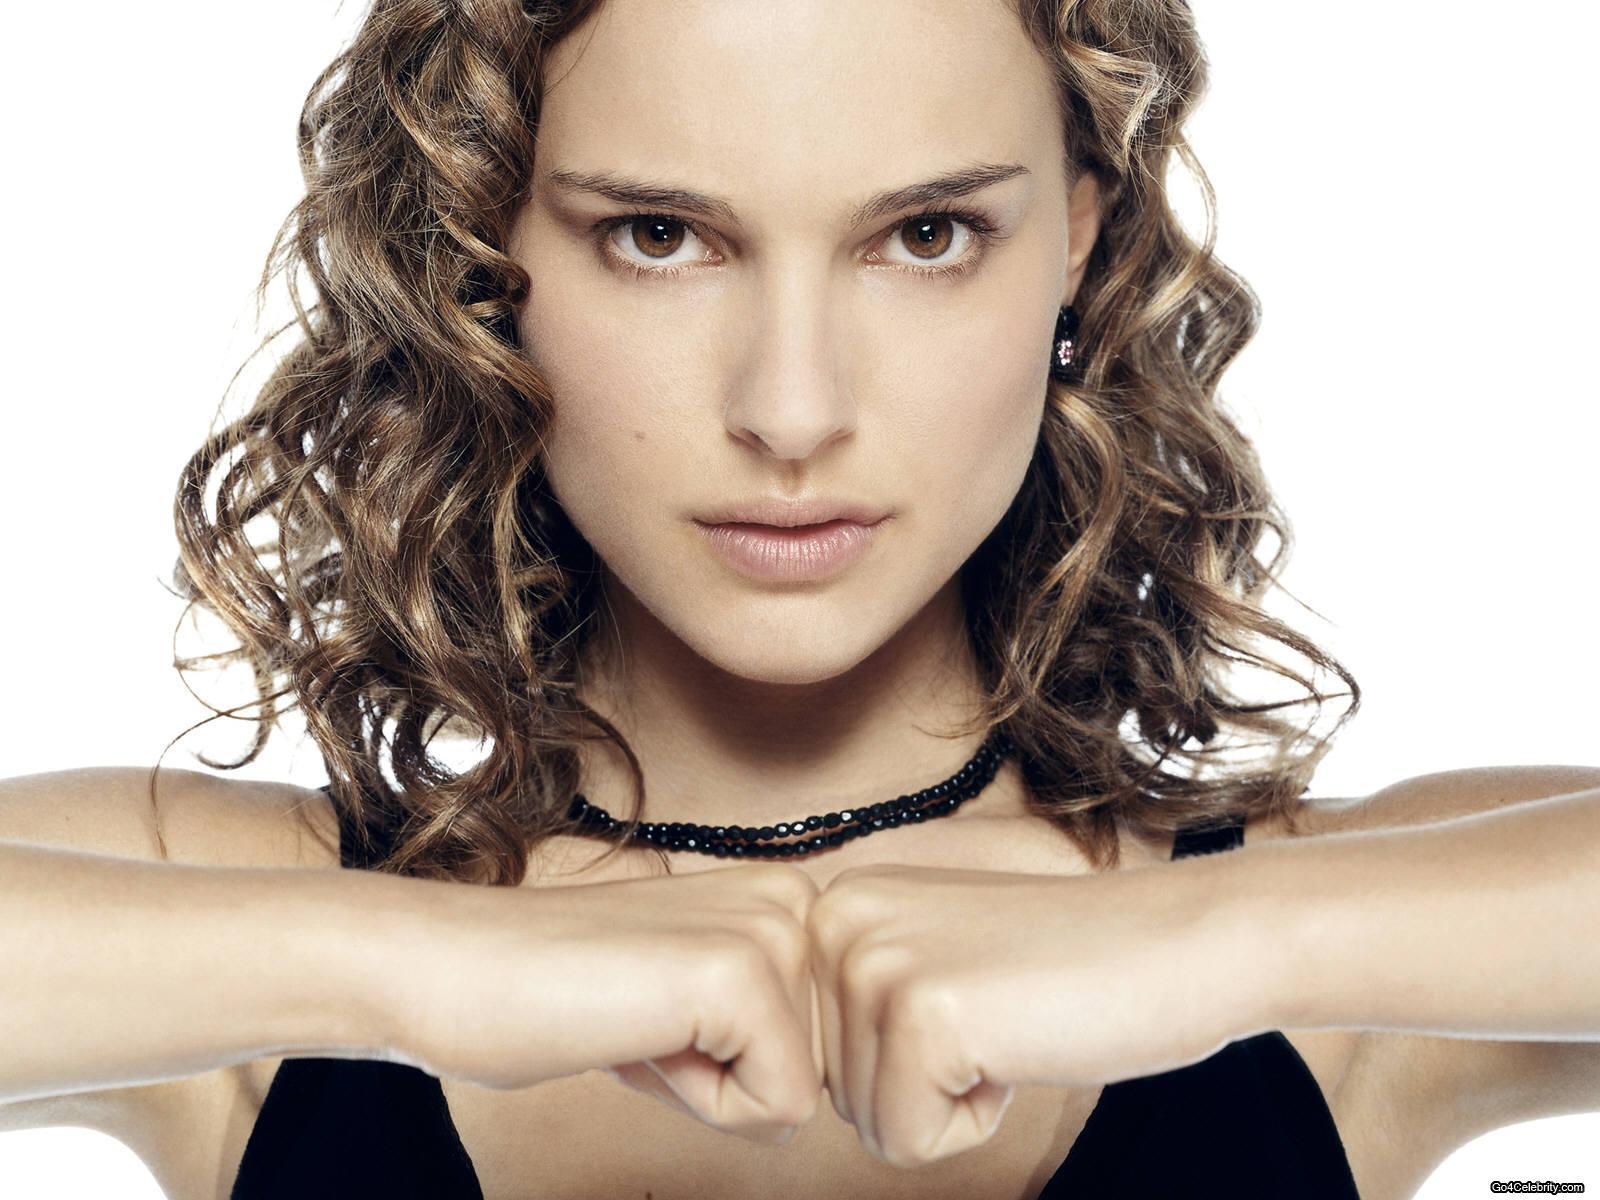 Uneedallinside Natalie Portman Latest Images  Hot Stills -7352